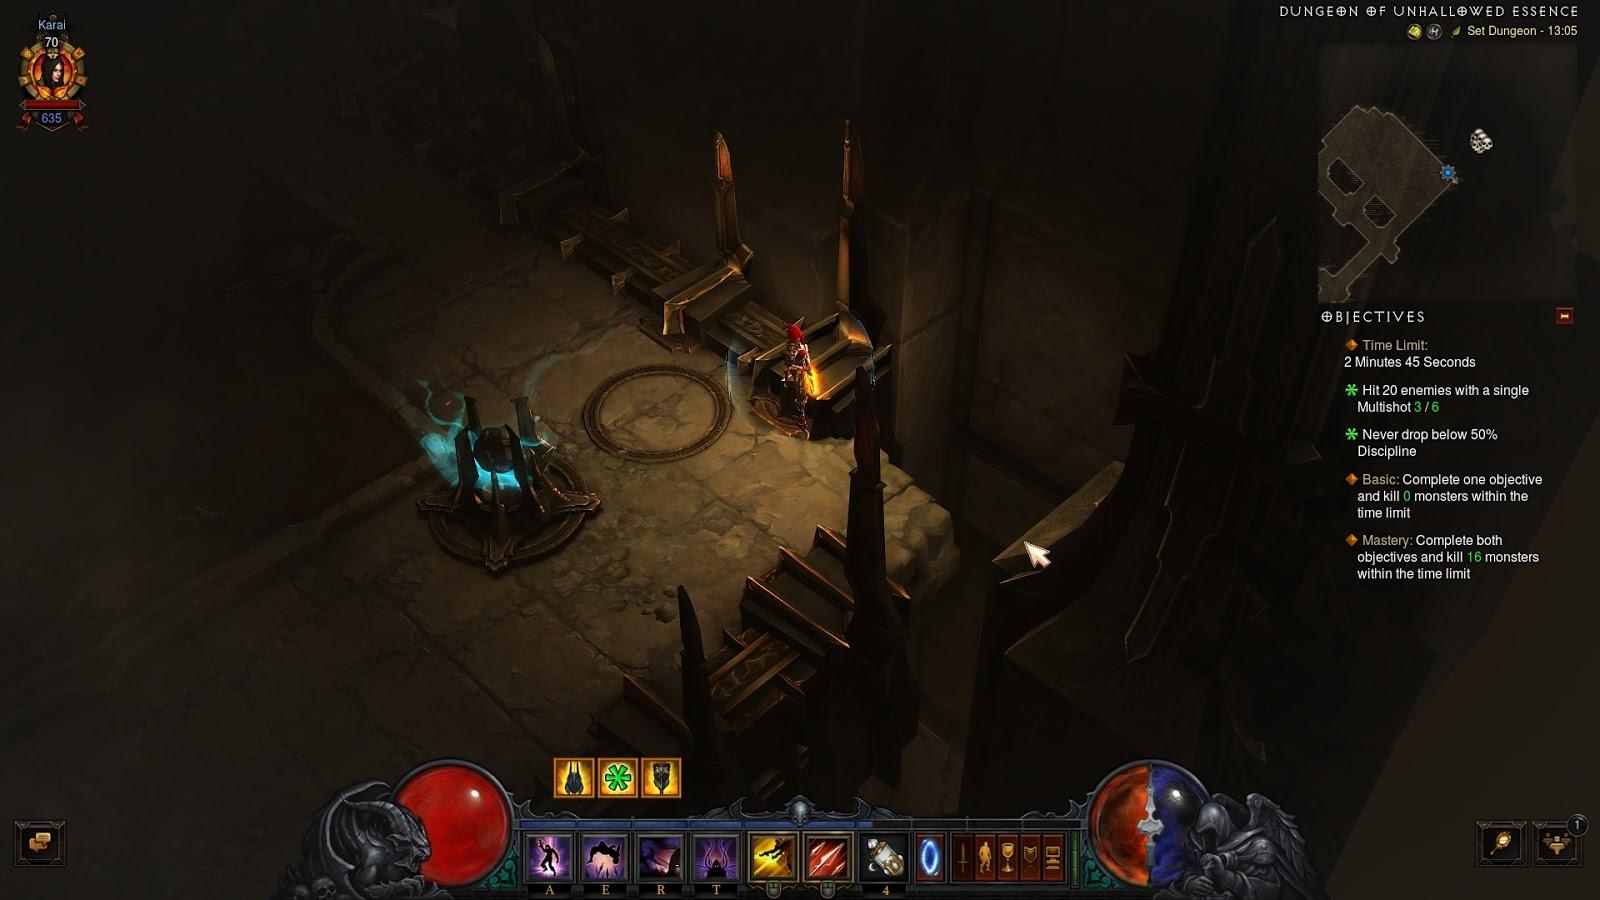 Unhallowed Essence set dungeon bugged? - Diablo III Forums